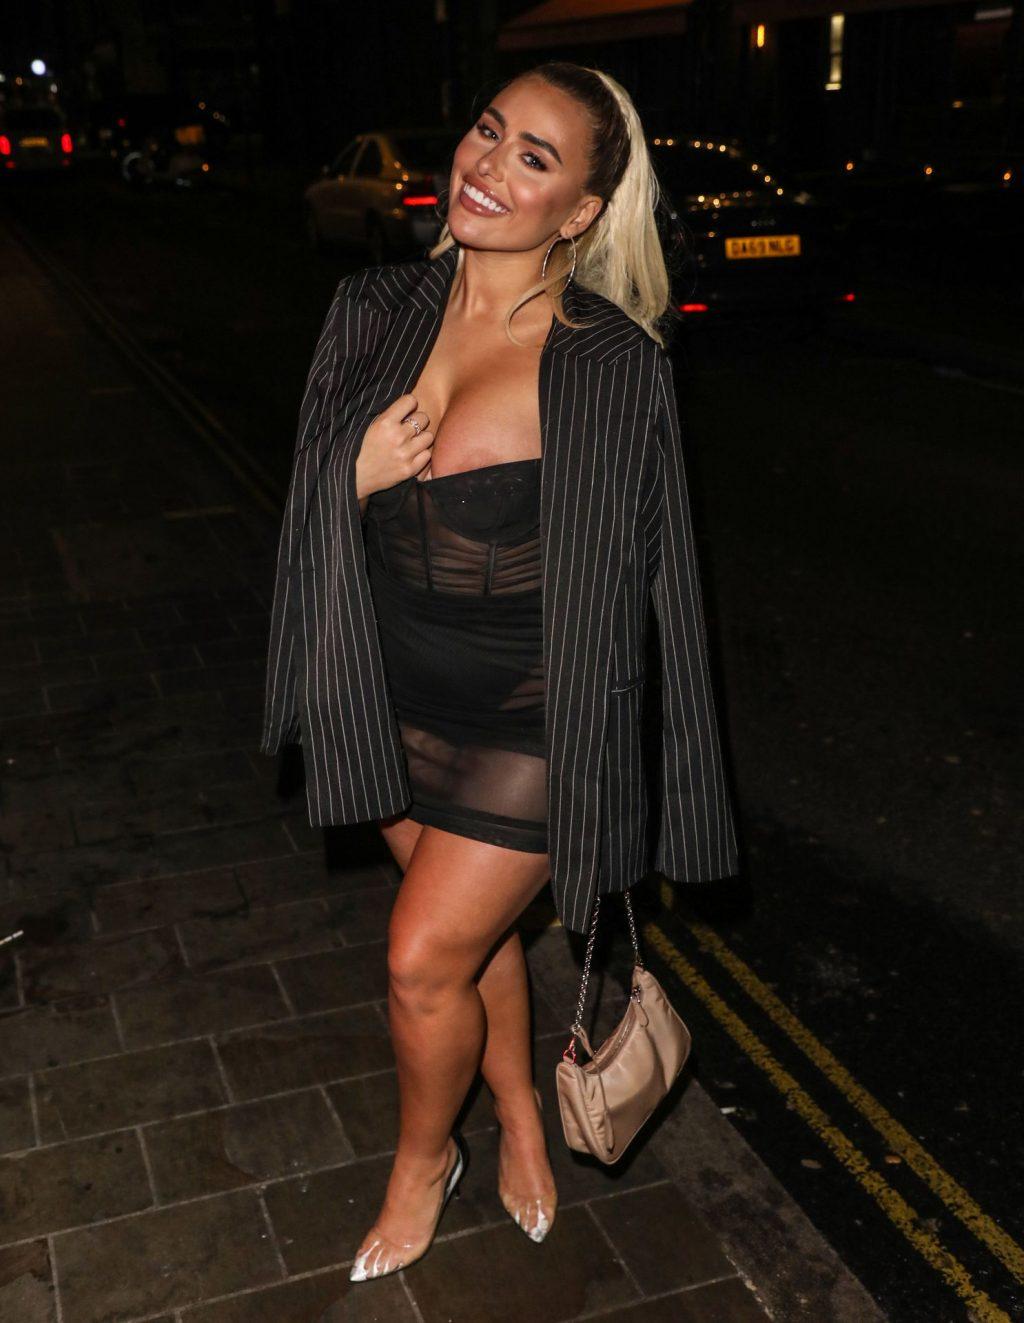 Ellie Brown Shows Off Her Boobs at Ballie Ballerson in Soho (24 Photos)